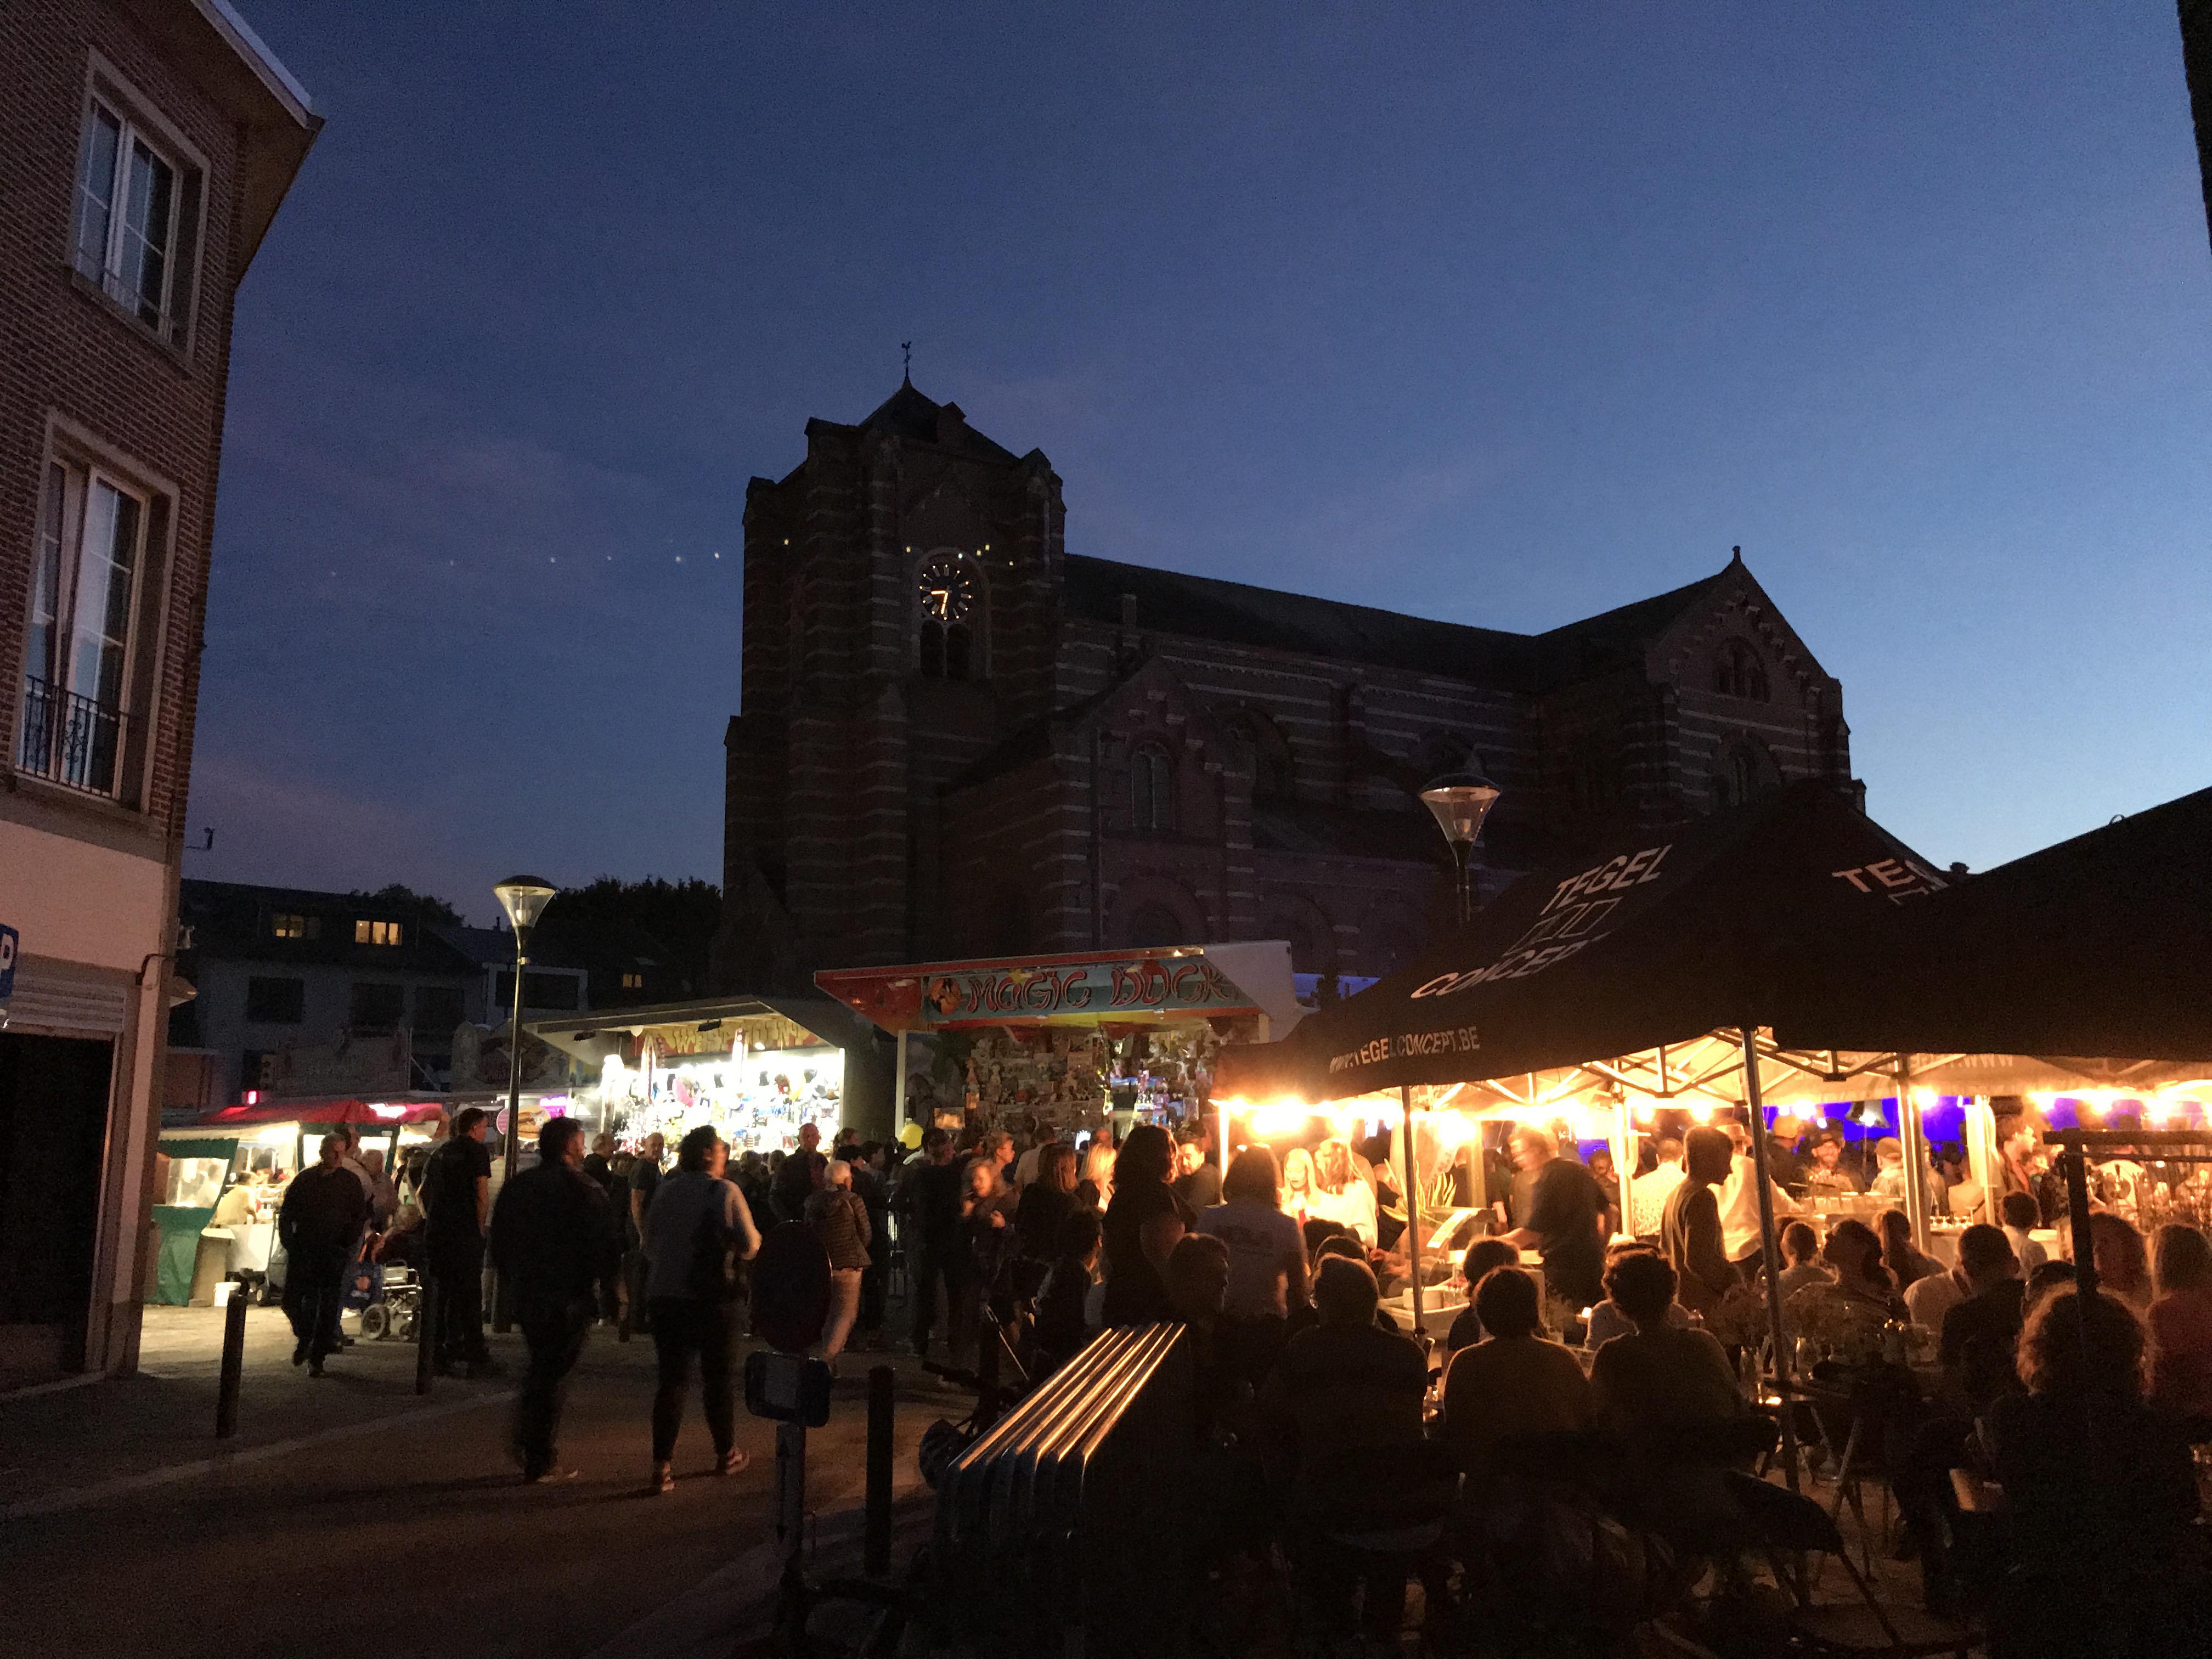 Druivenfestival 2019 (foto credits: Eddy Olislaeger)